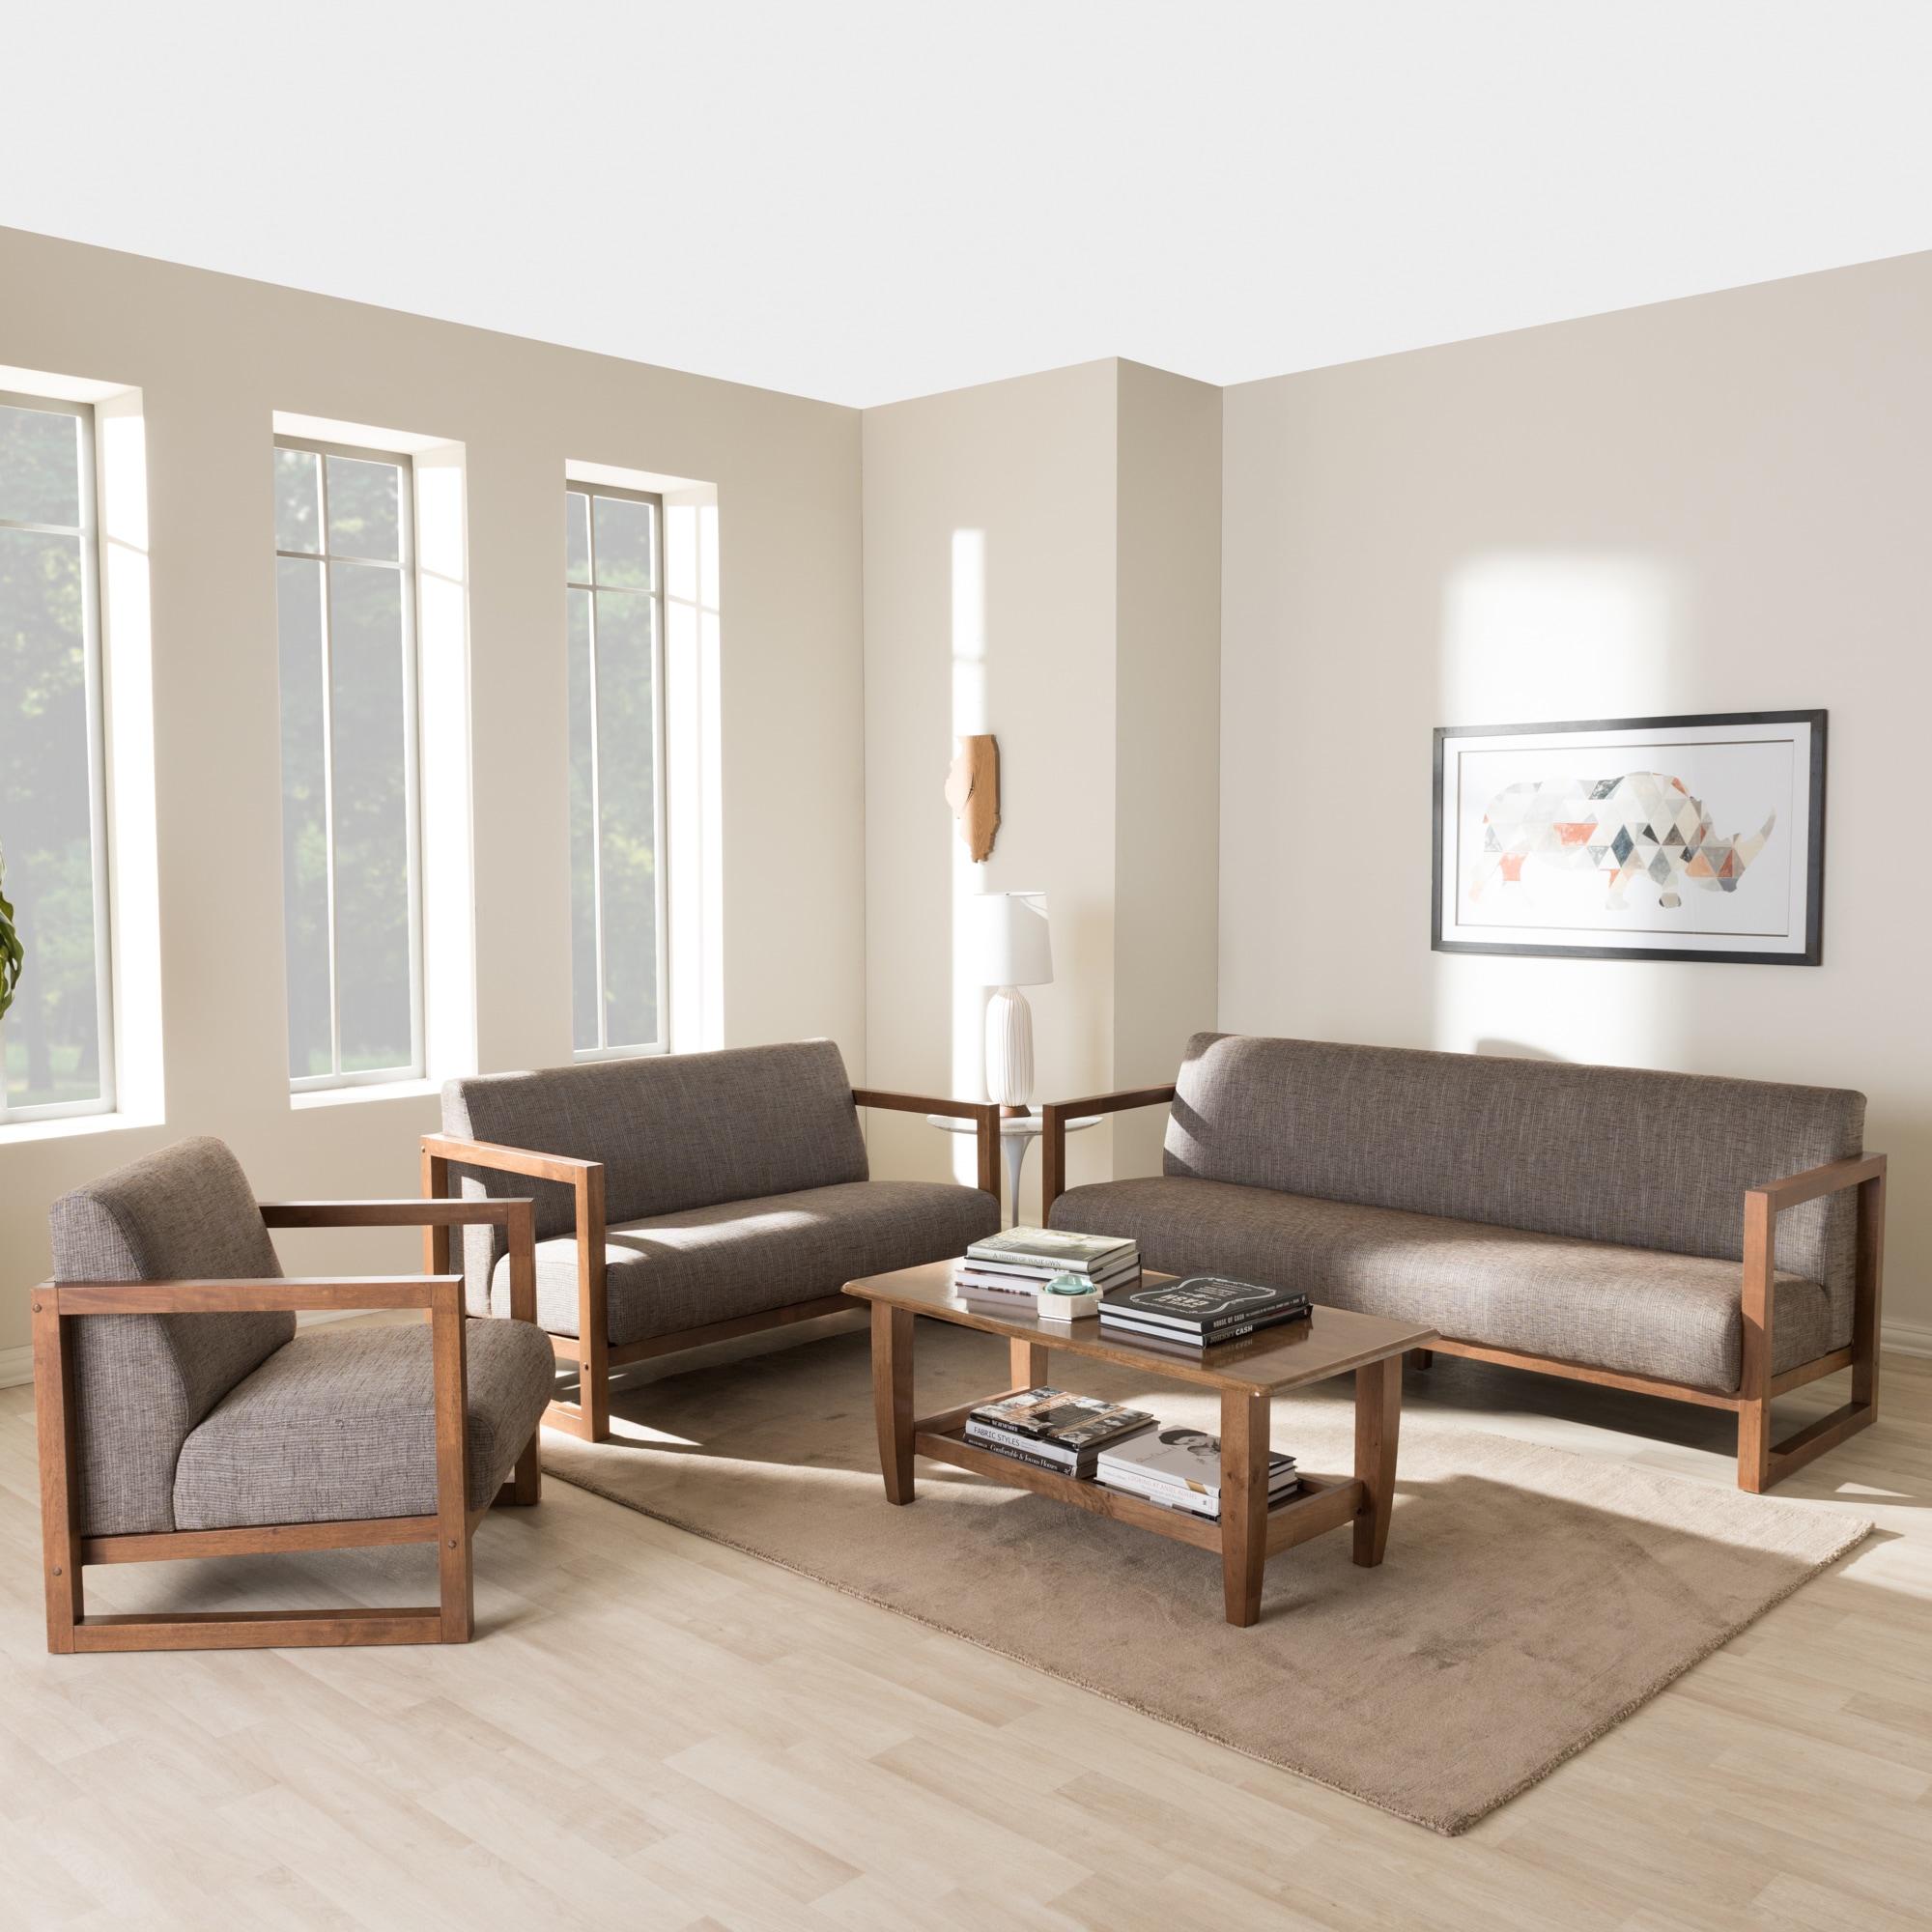 Baxton studio philomela mid century modern grey upholstered living room sofa set